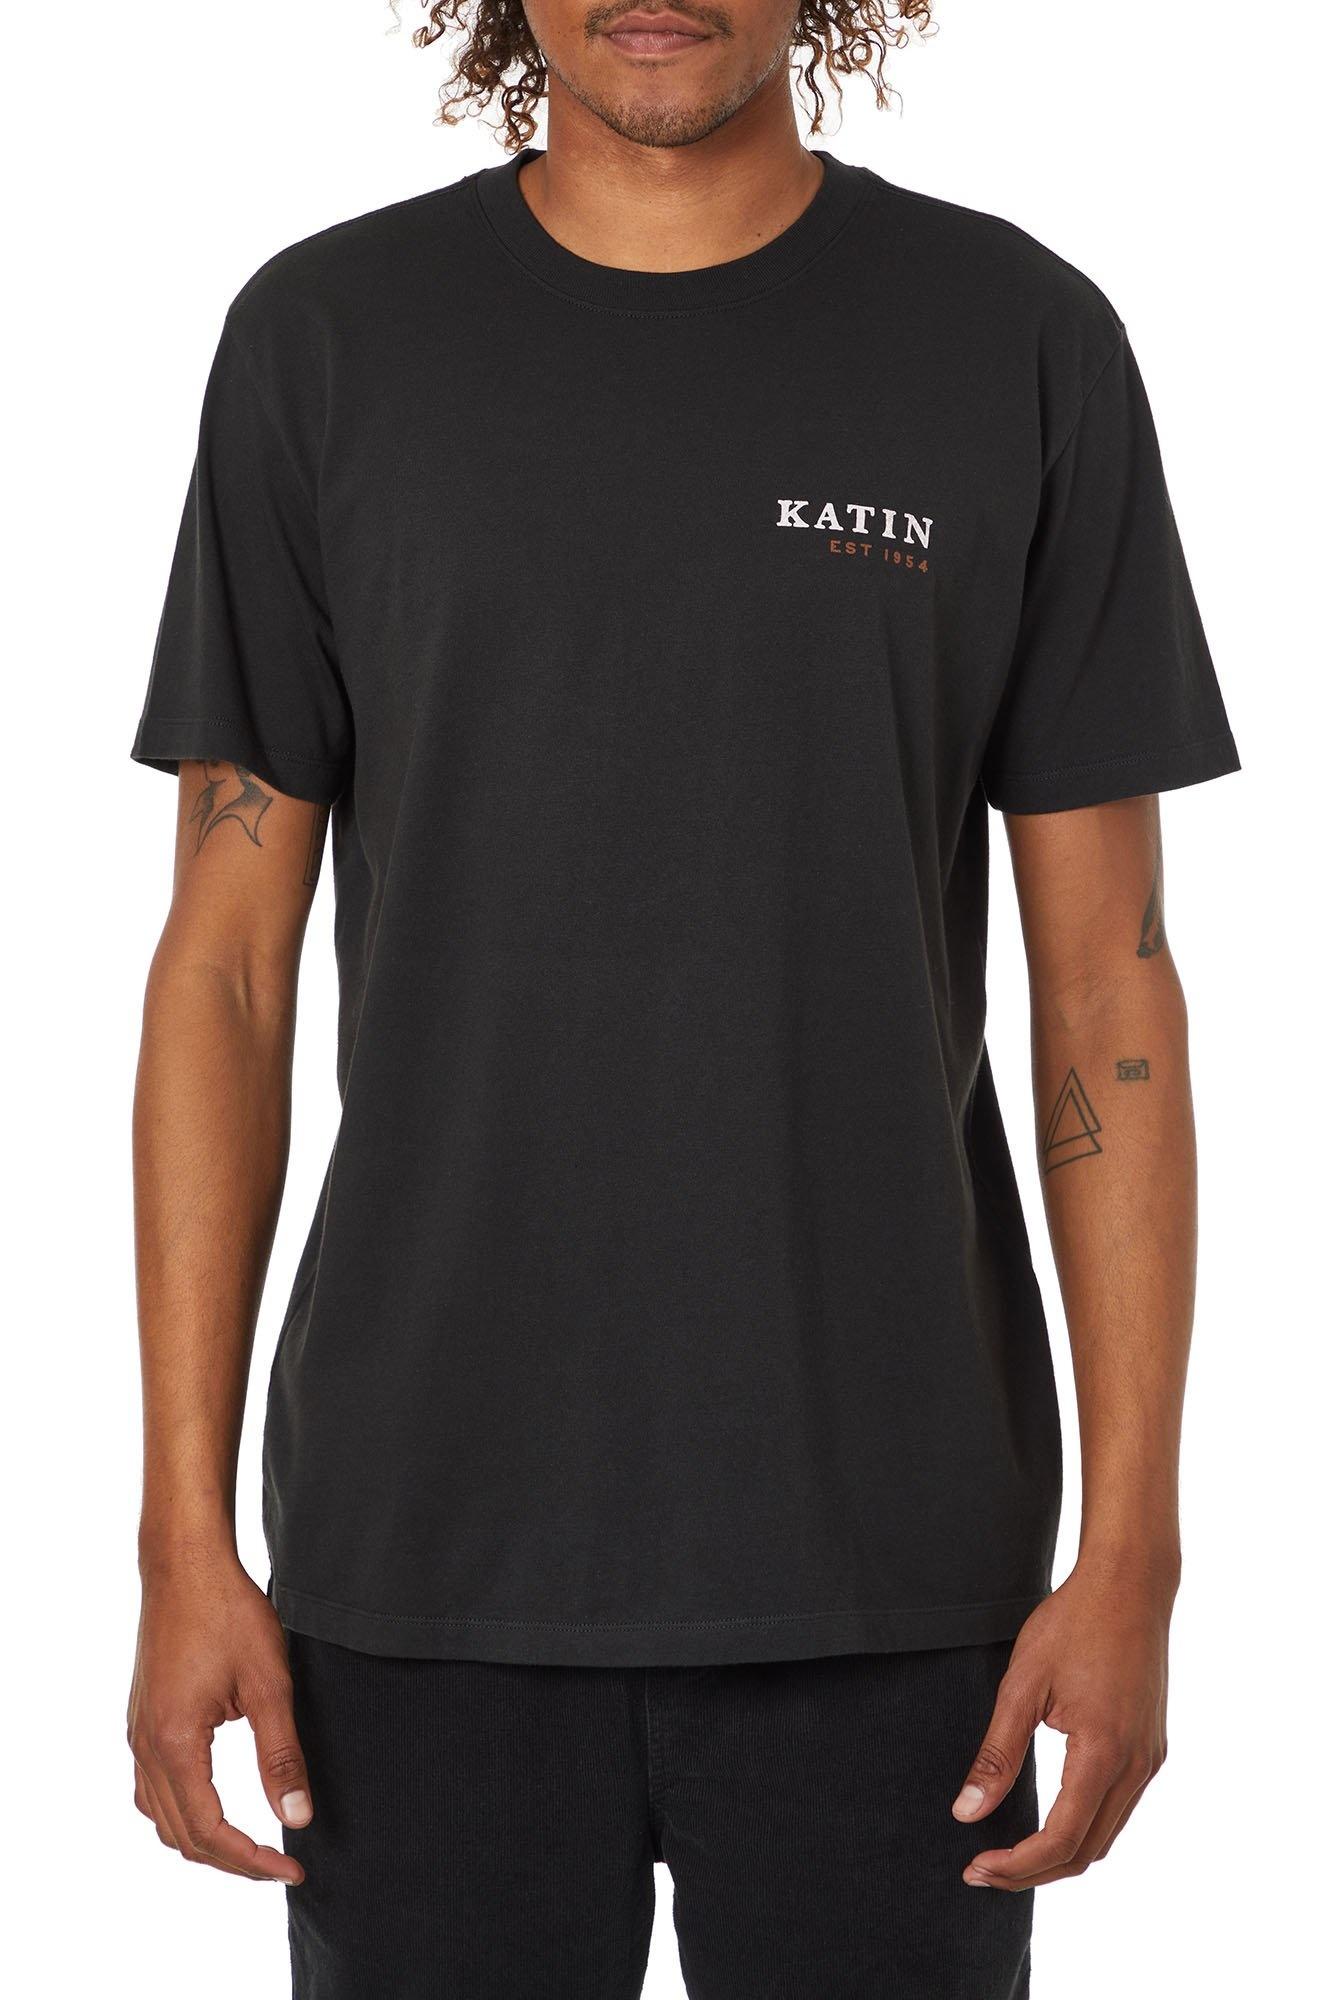 KatinUSA Katin - Undisclosed Tee